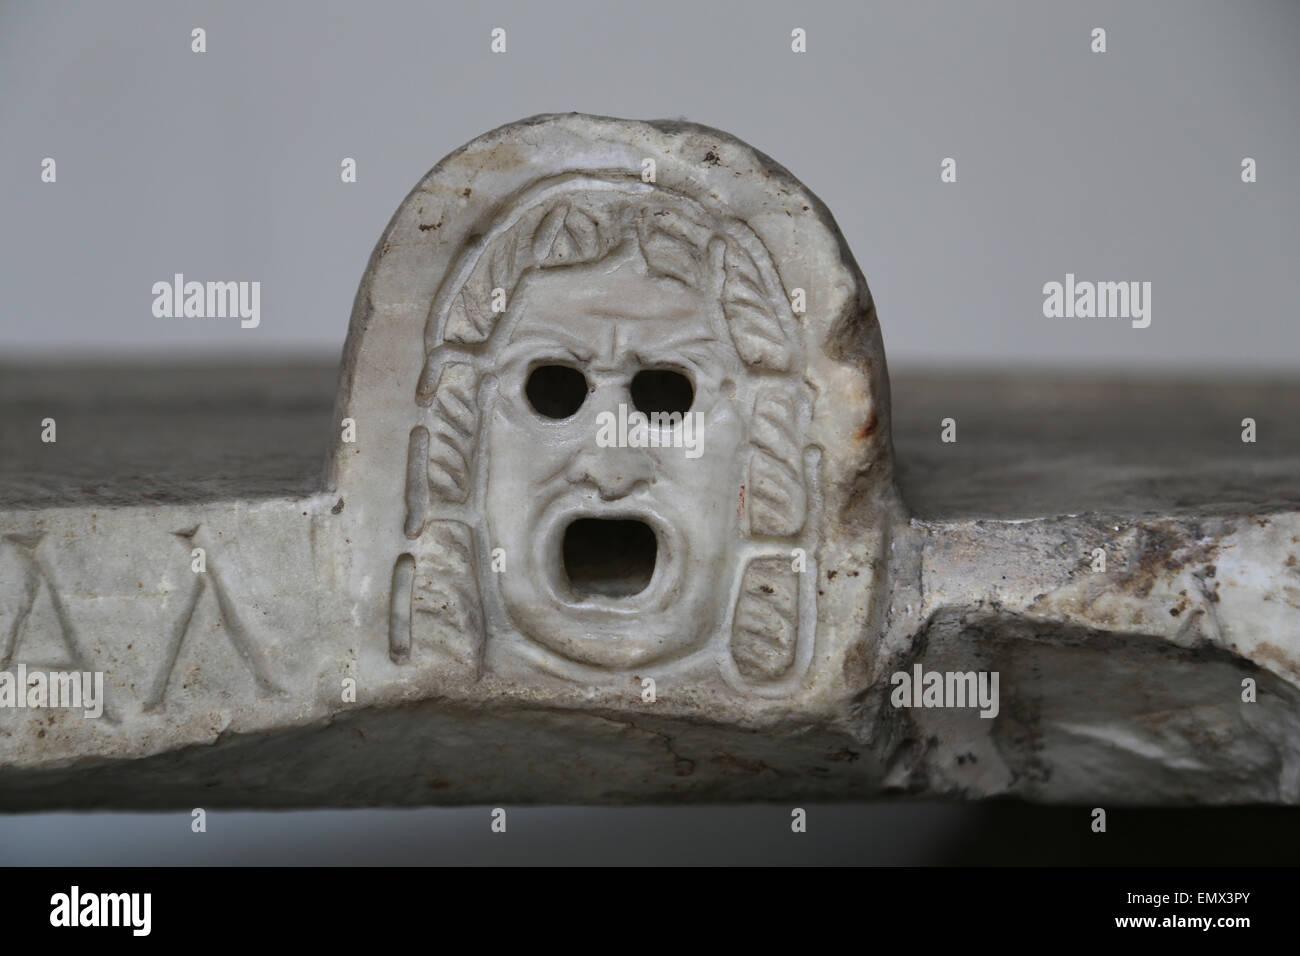 Roman art. Theatrical mask. Sarcophagus. Detail. Vatican Museum. Vatican city. - Stock Image